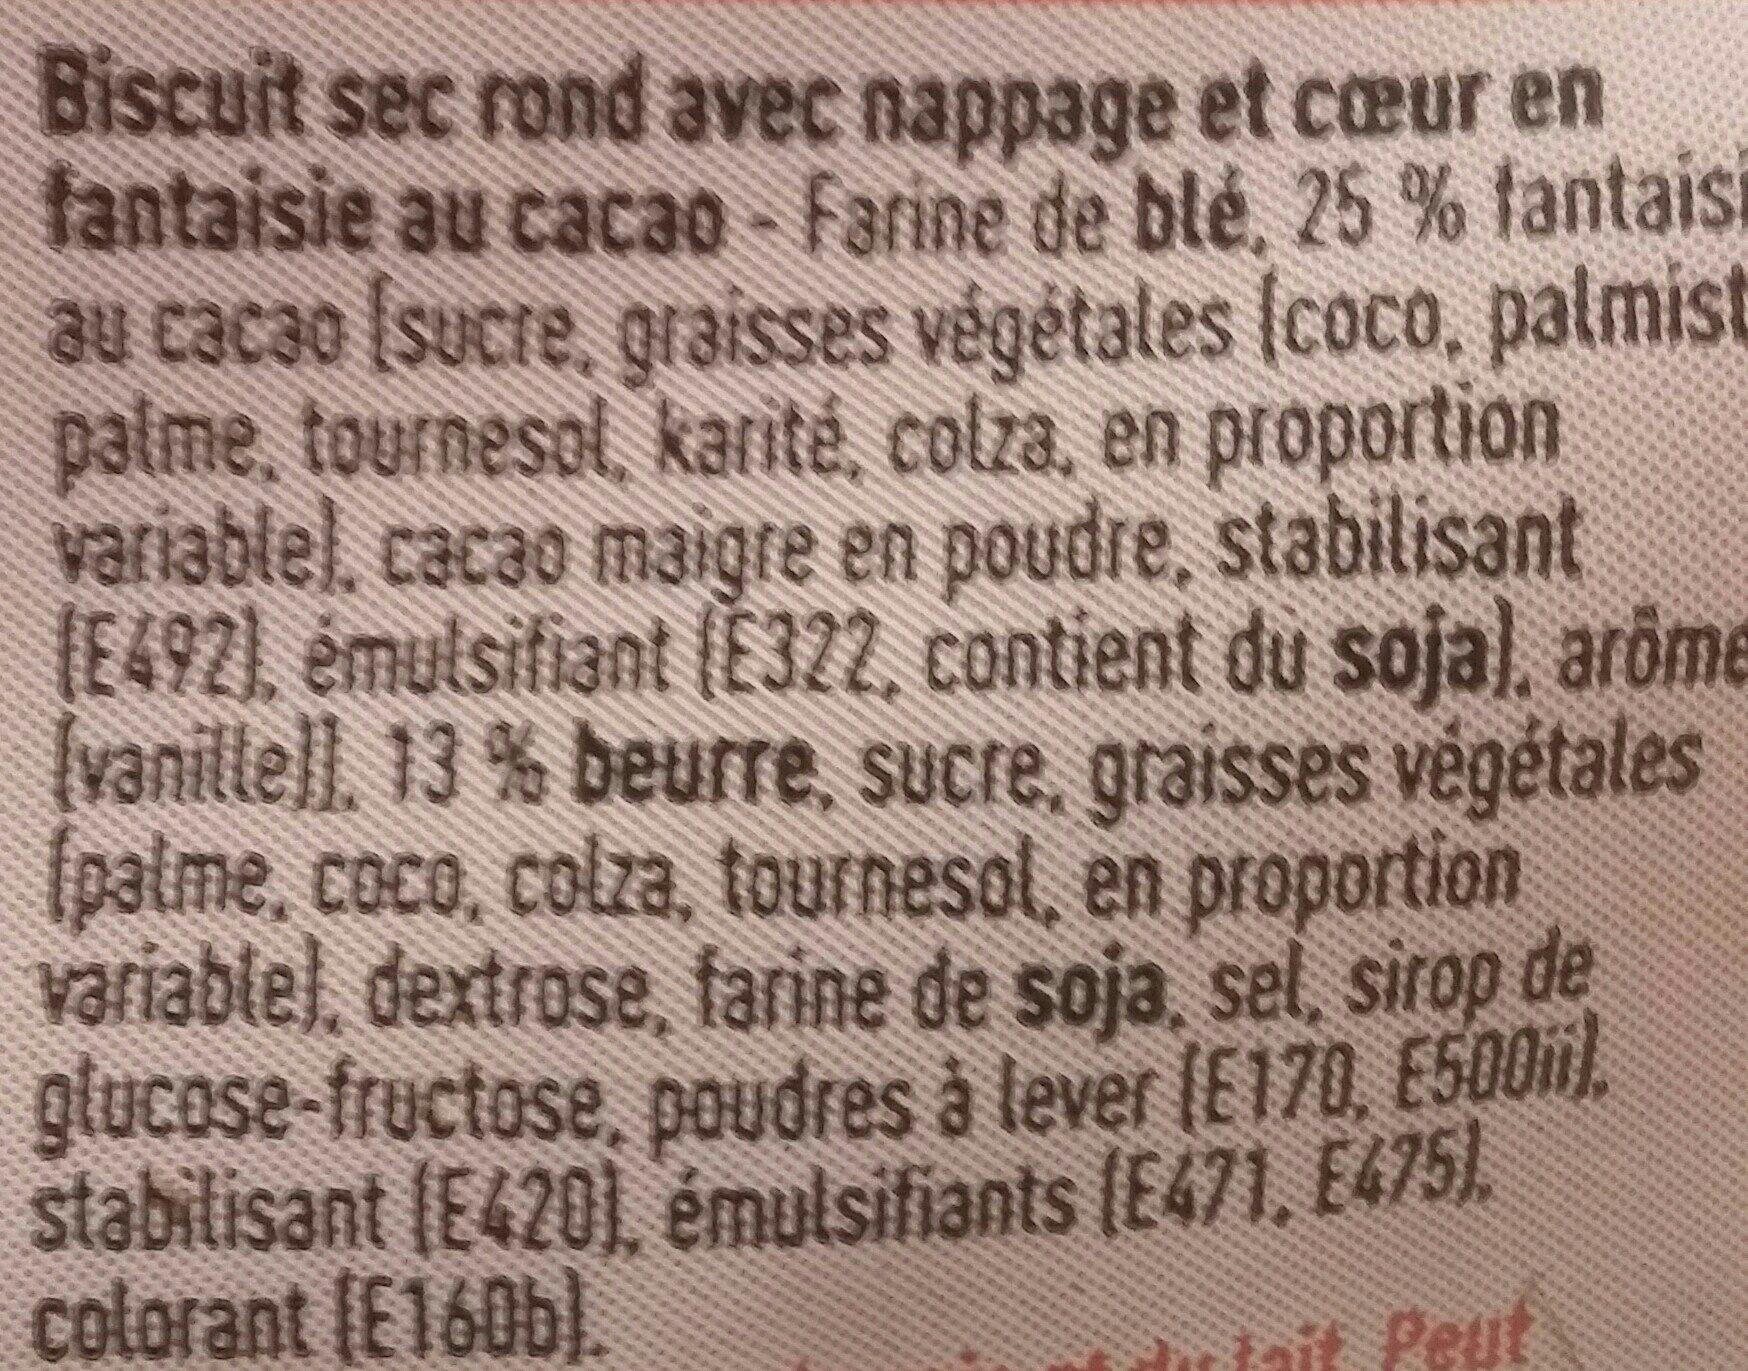 Marguerites - Ingredients